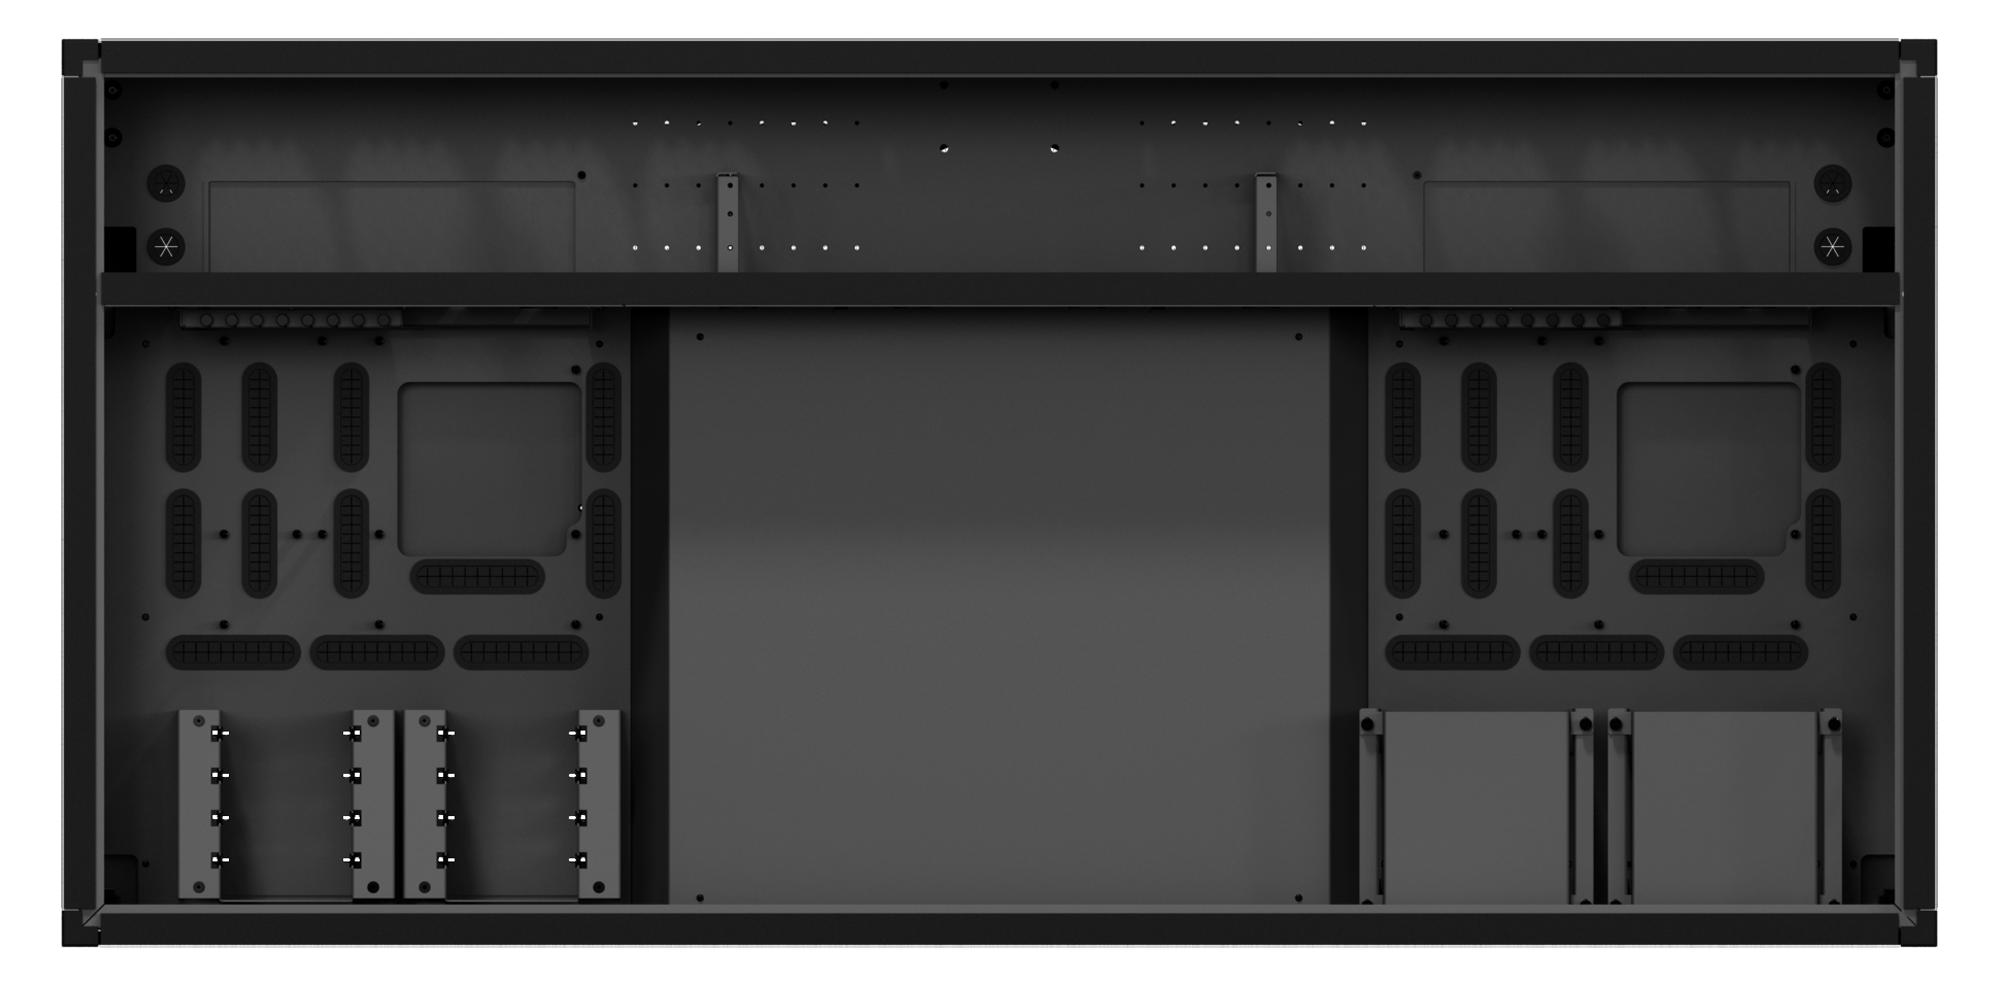 Computer clipart casing. Press dualdesk